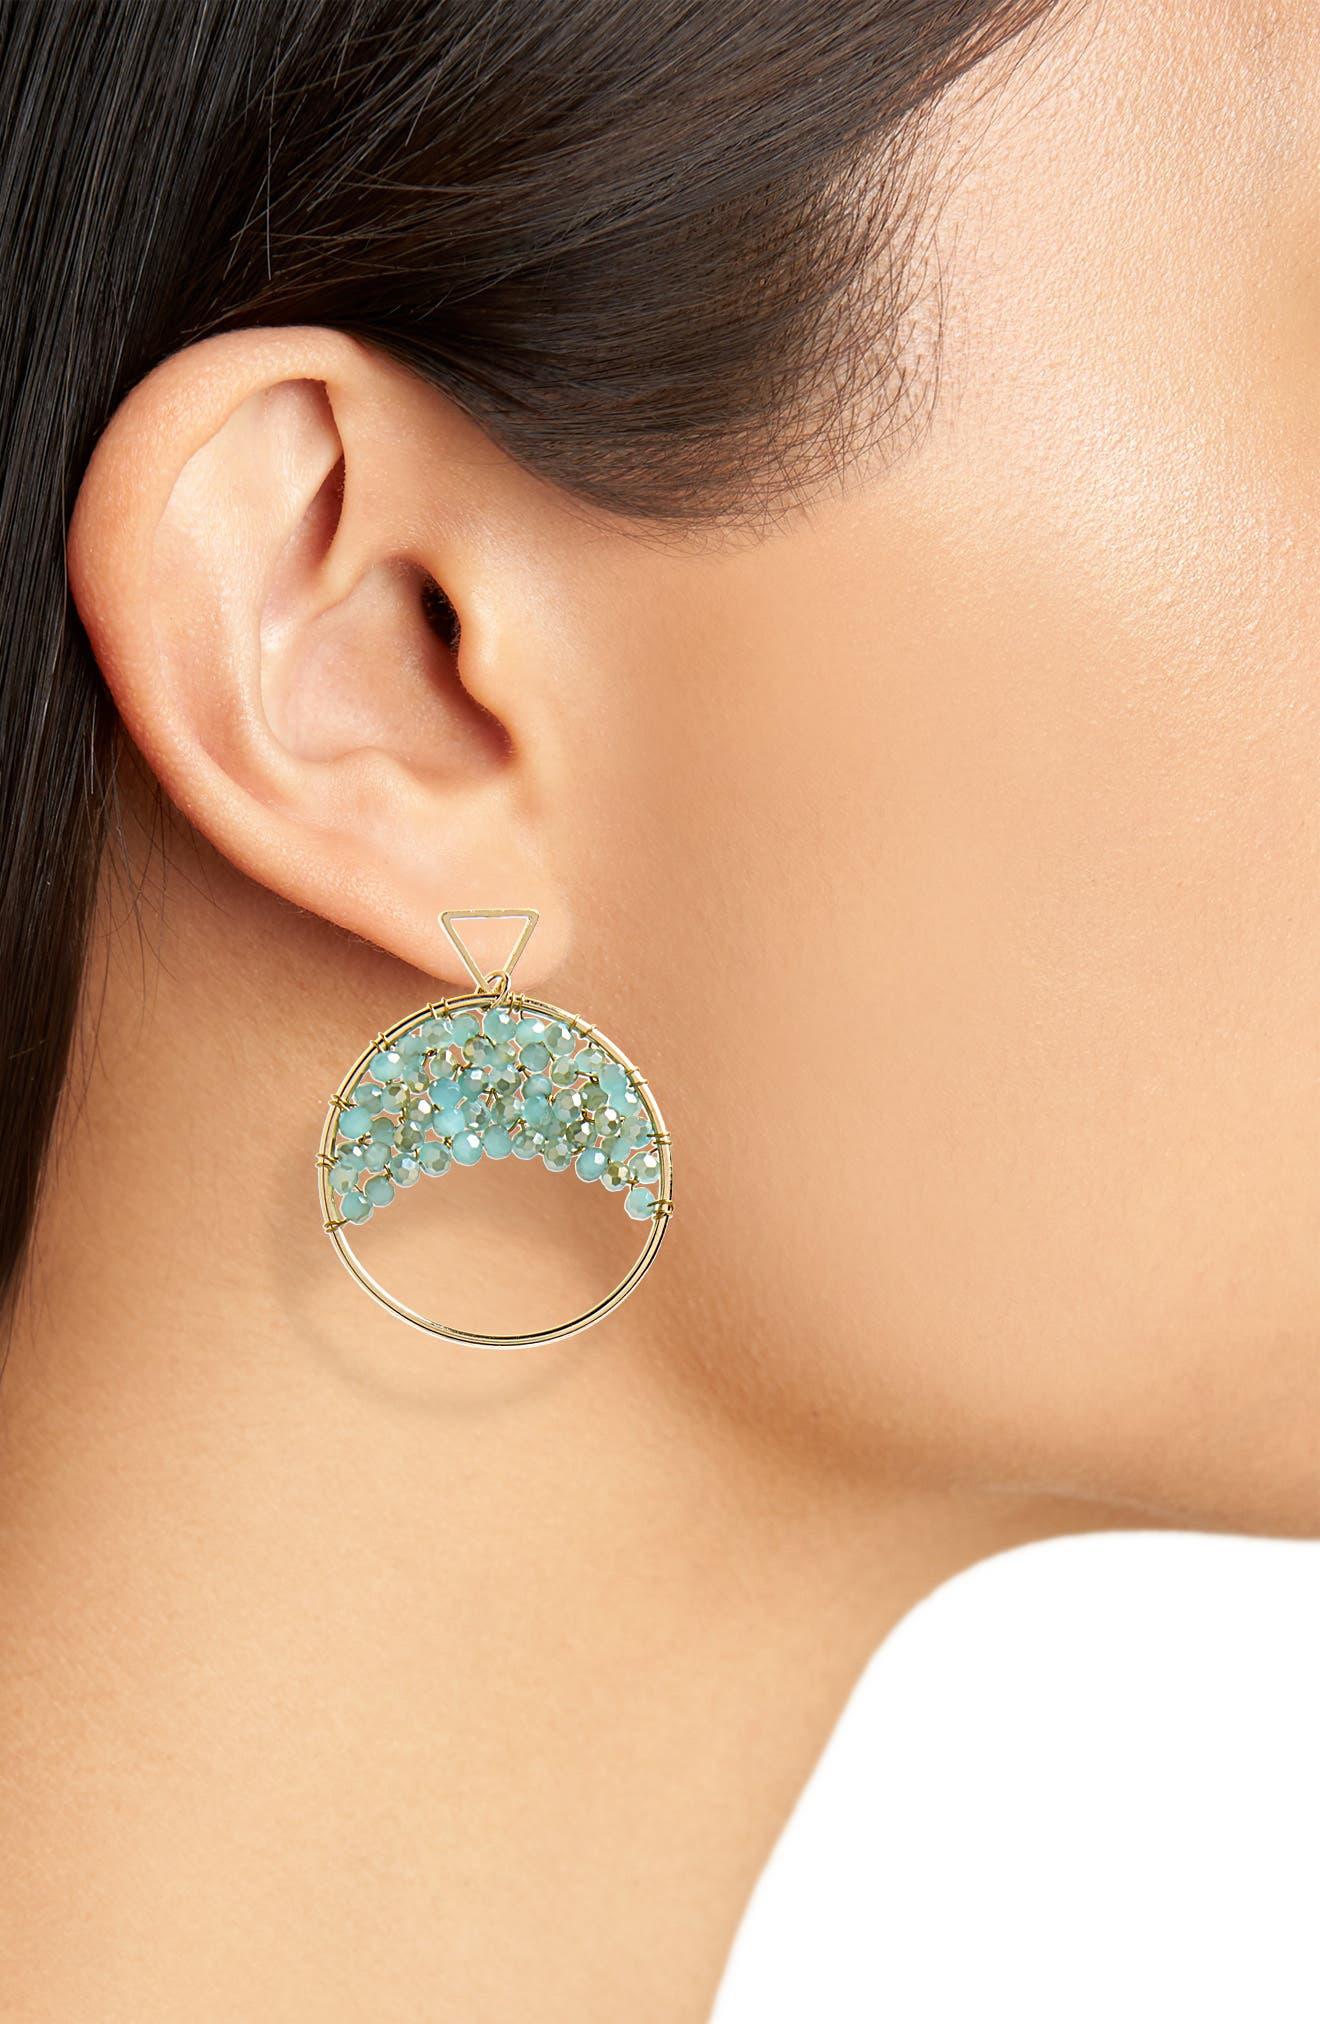 Crystal Beaded Circle Earrings,                             Alternate thumbnail 2, color,                             MINT